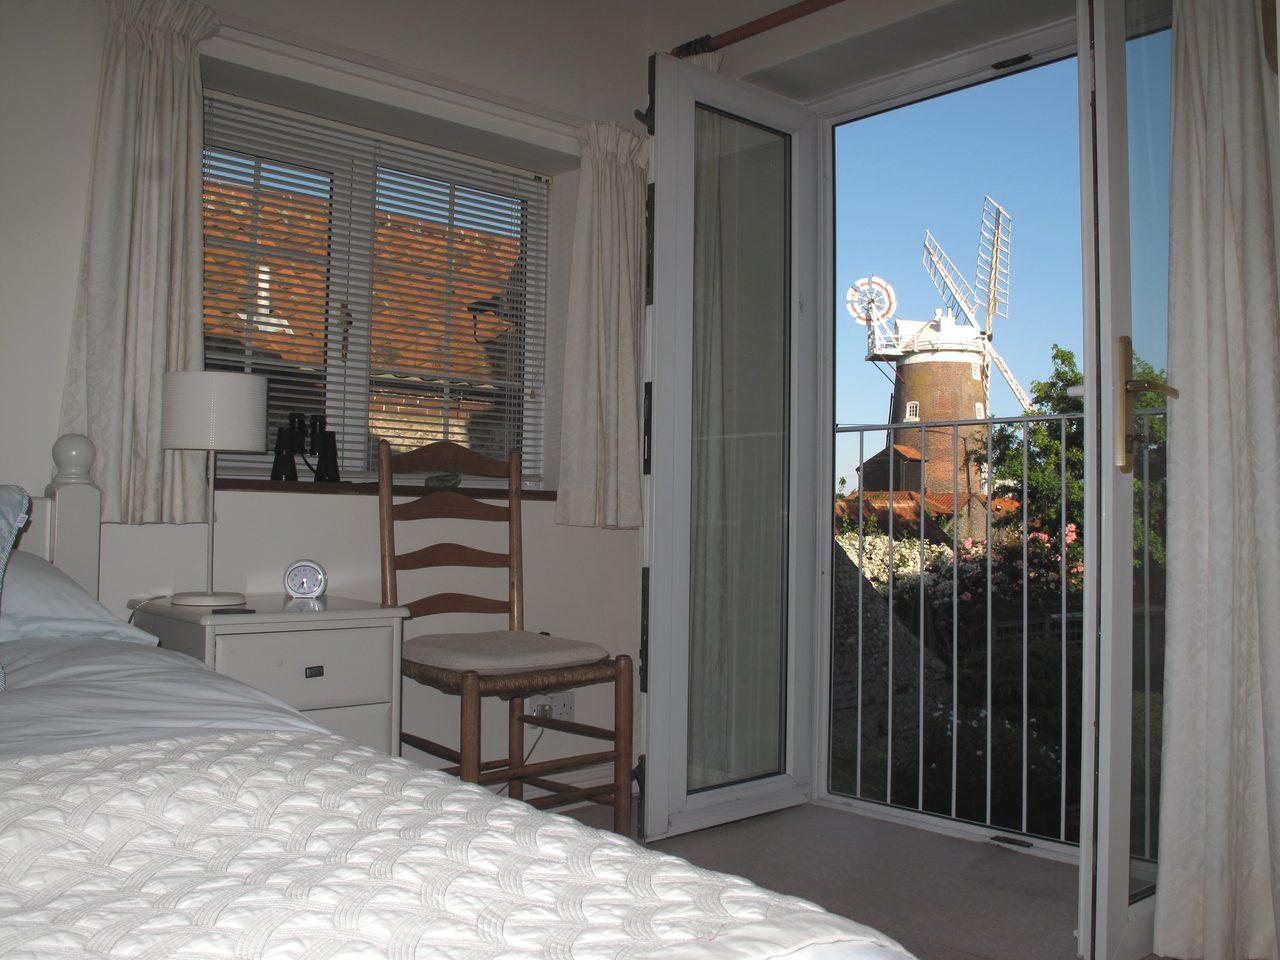 Zetland Cottage Double Bedroom View